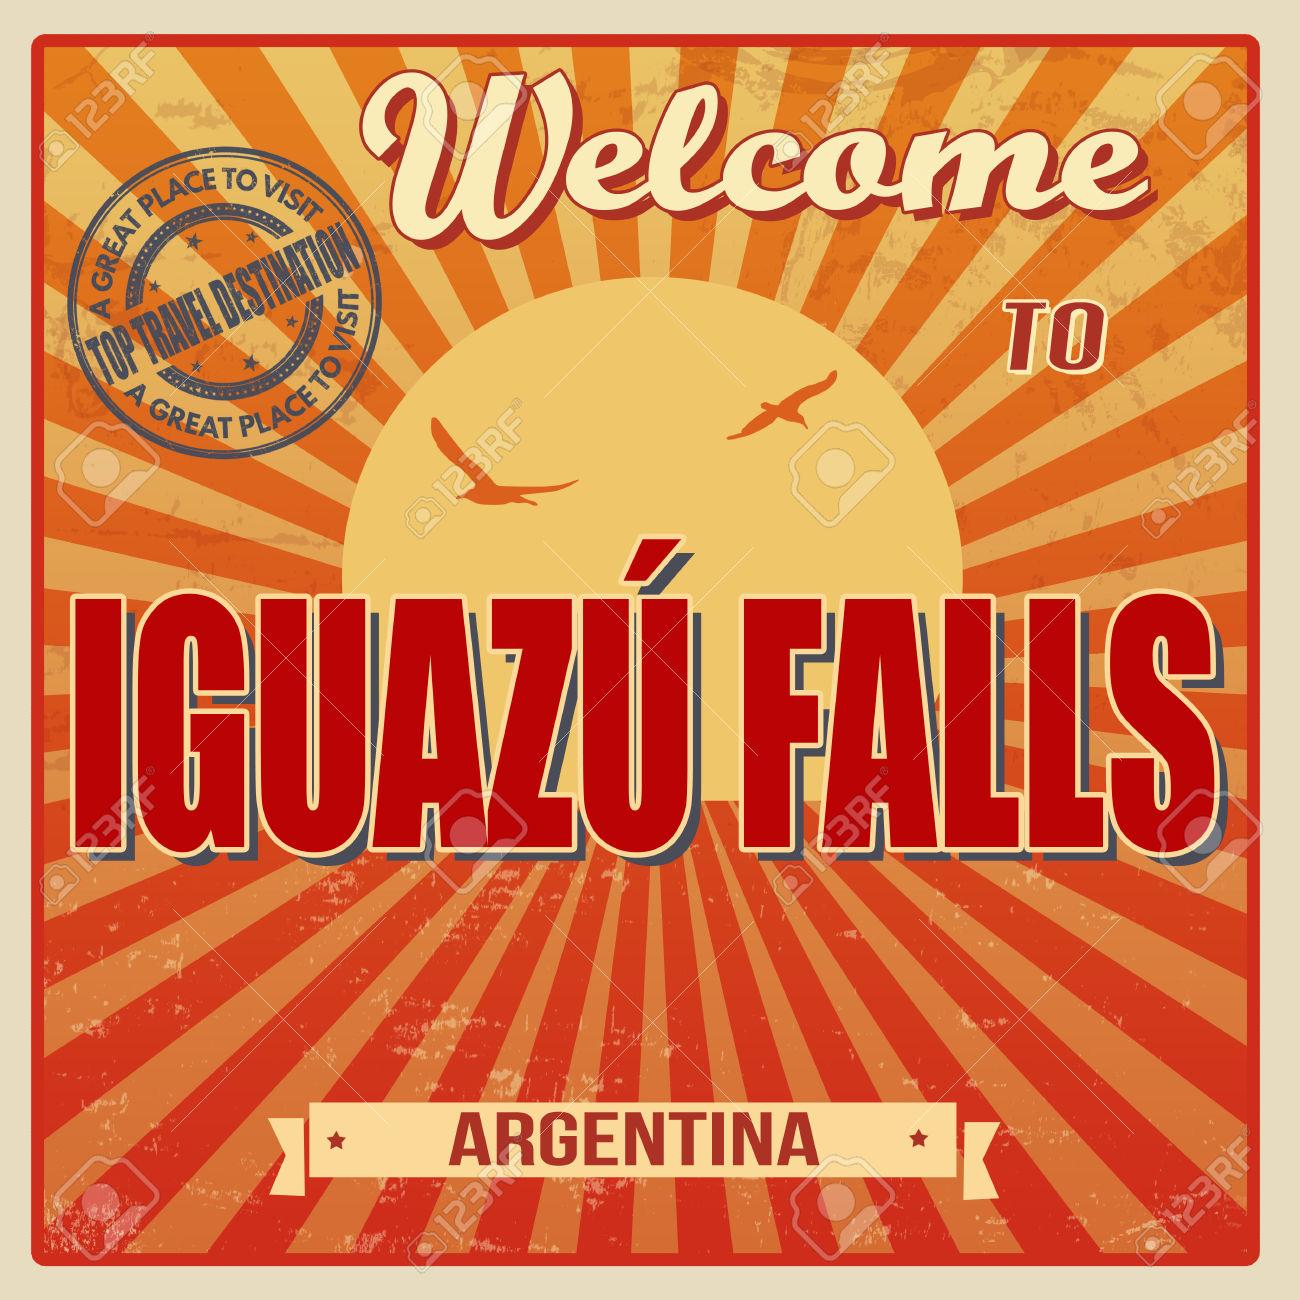 Iguazu Falls clipart #2, Download drawings